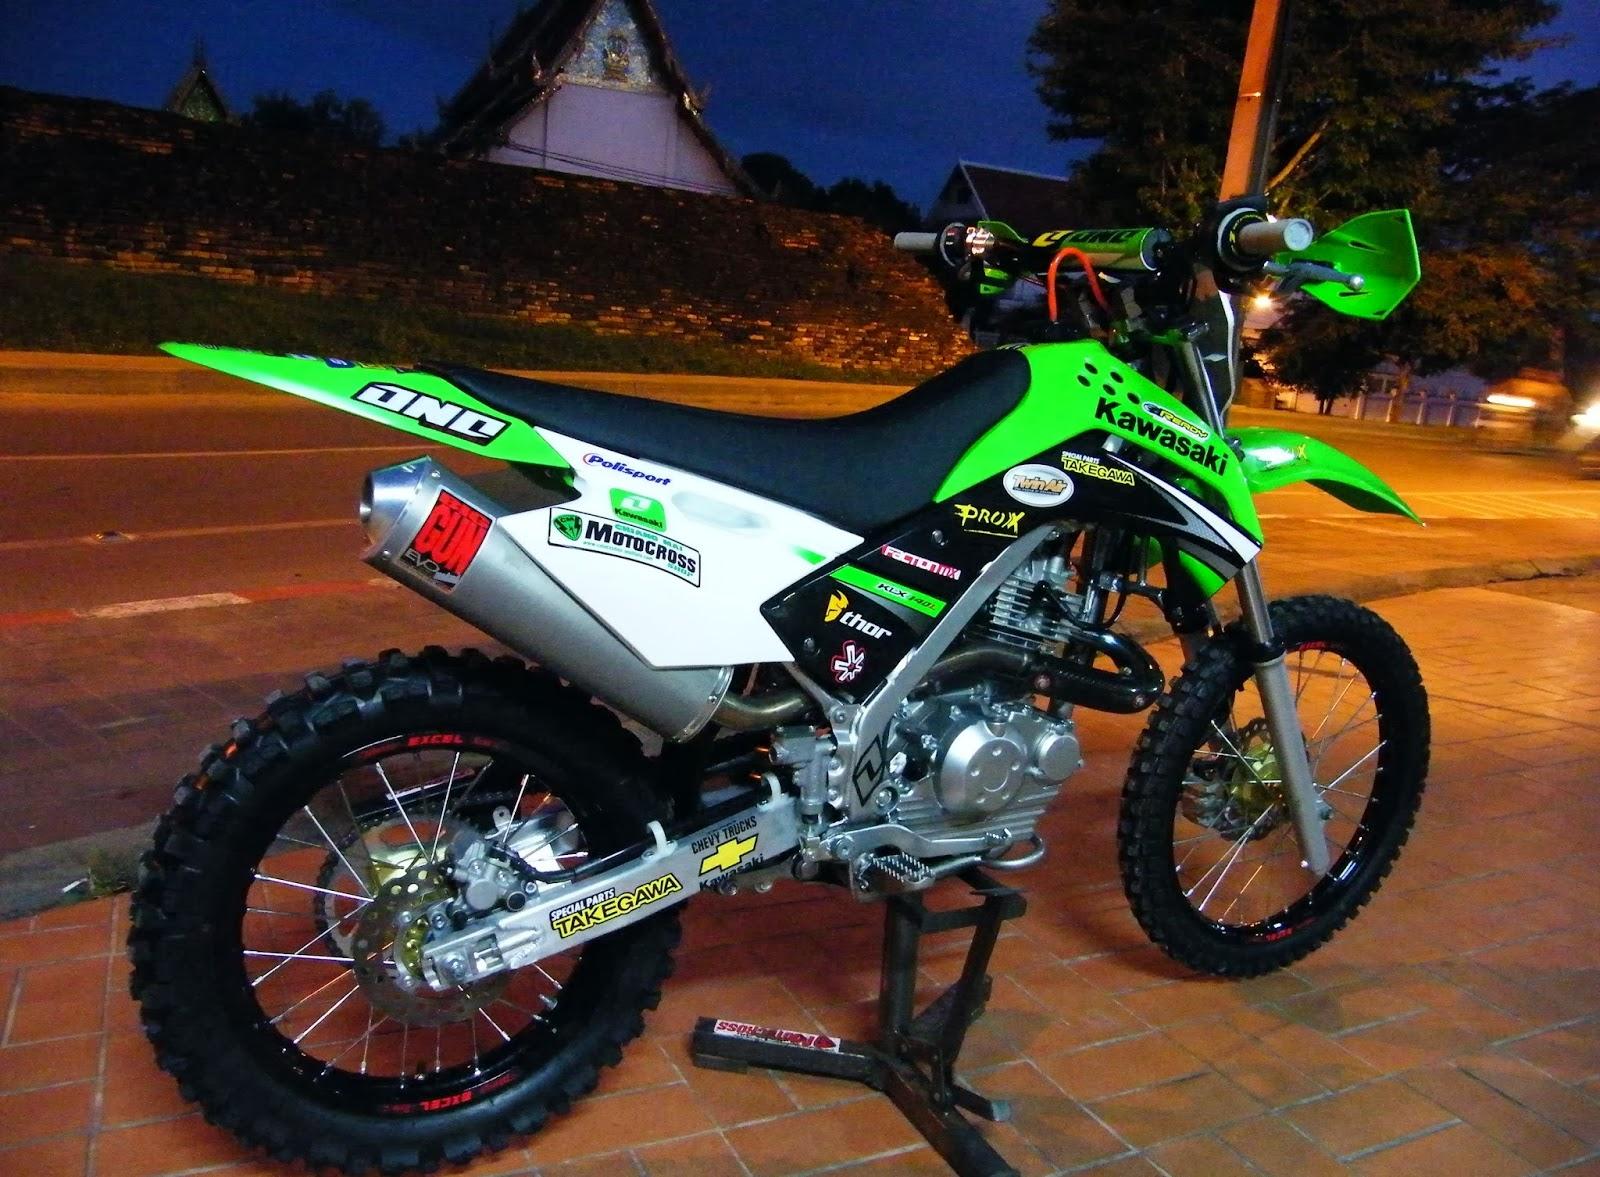 Kawasaki enduro latest Bikes